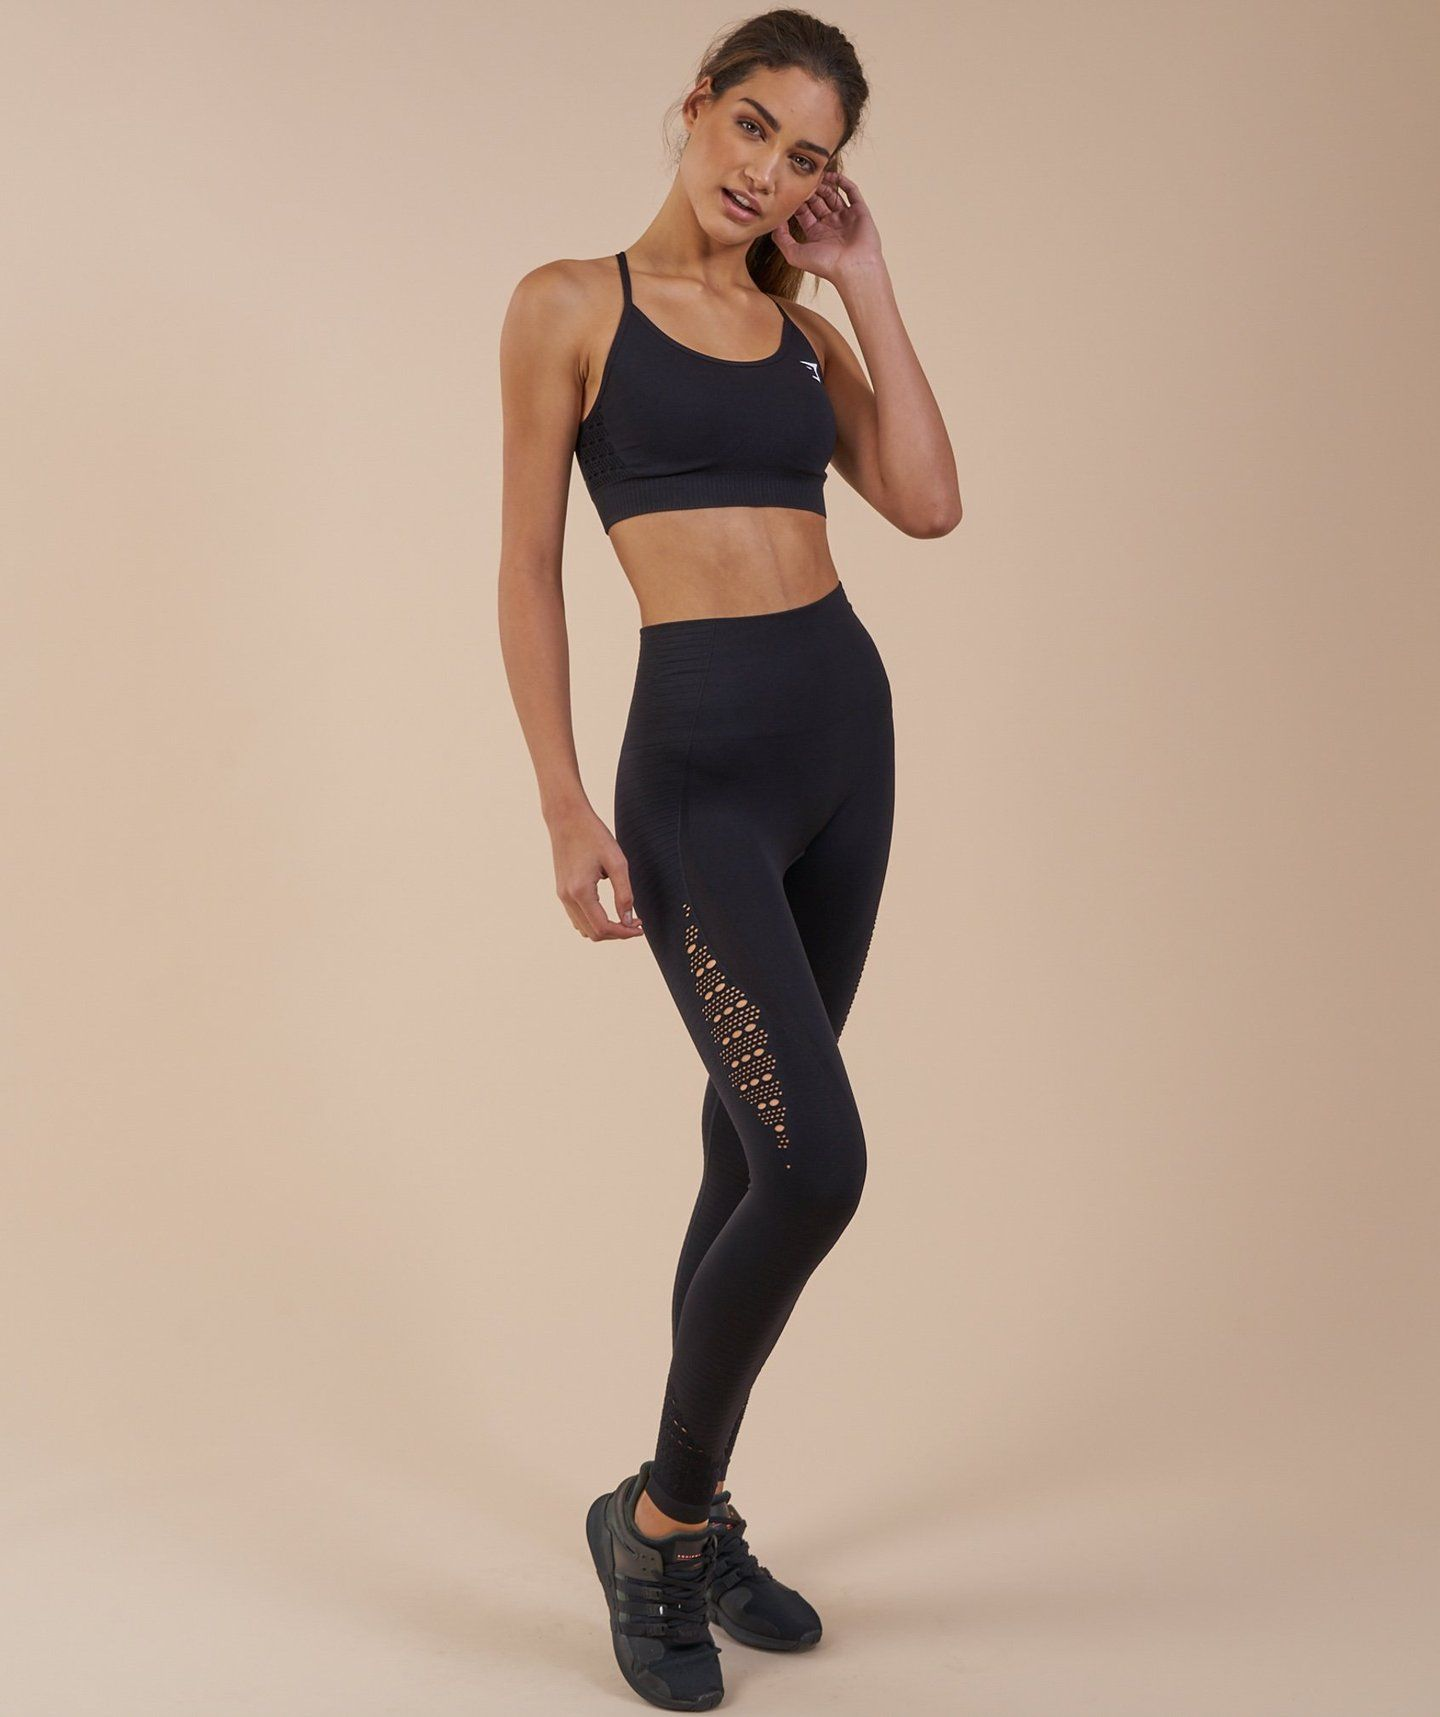 18563f0876eb1 Gymshark Energy Seamless High Waisted Leggings - Black | Activewear ...